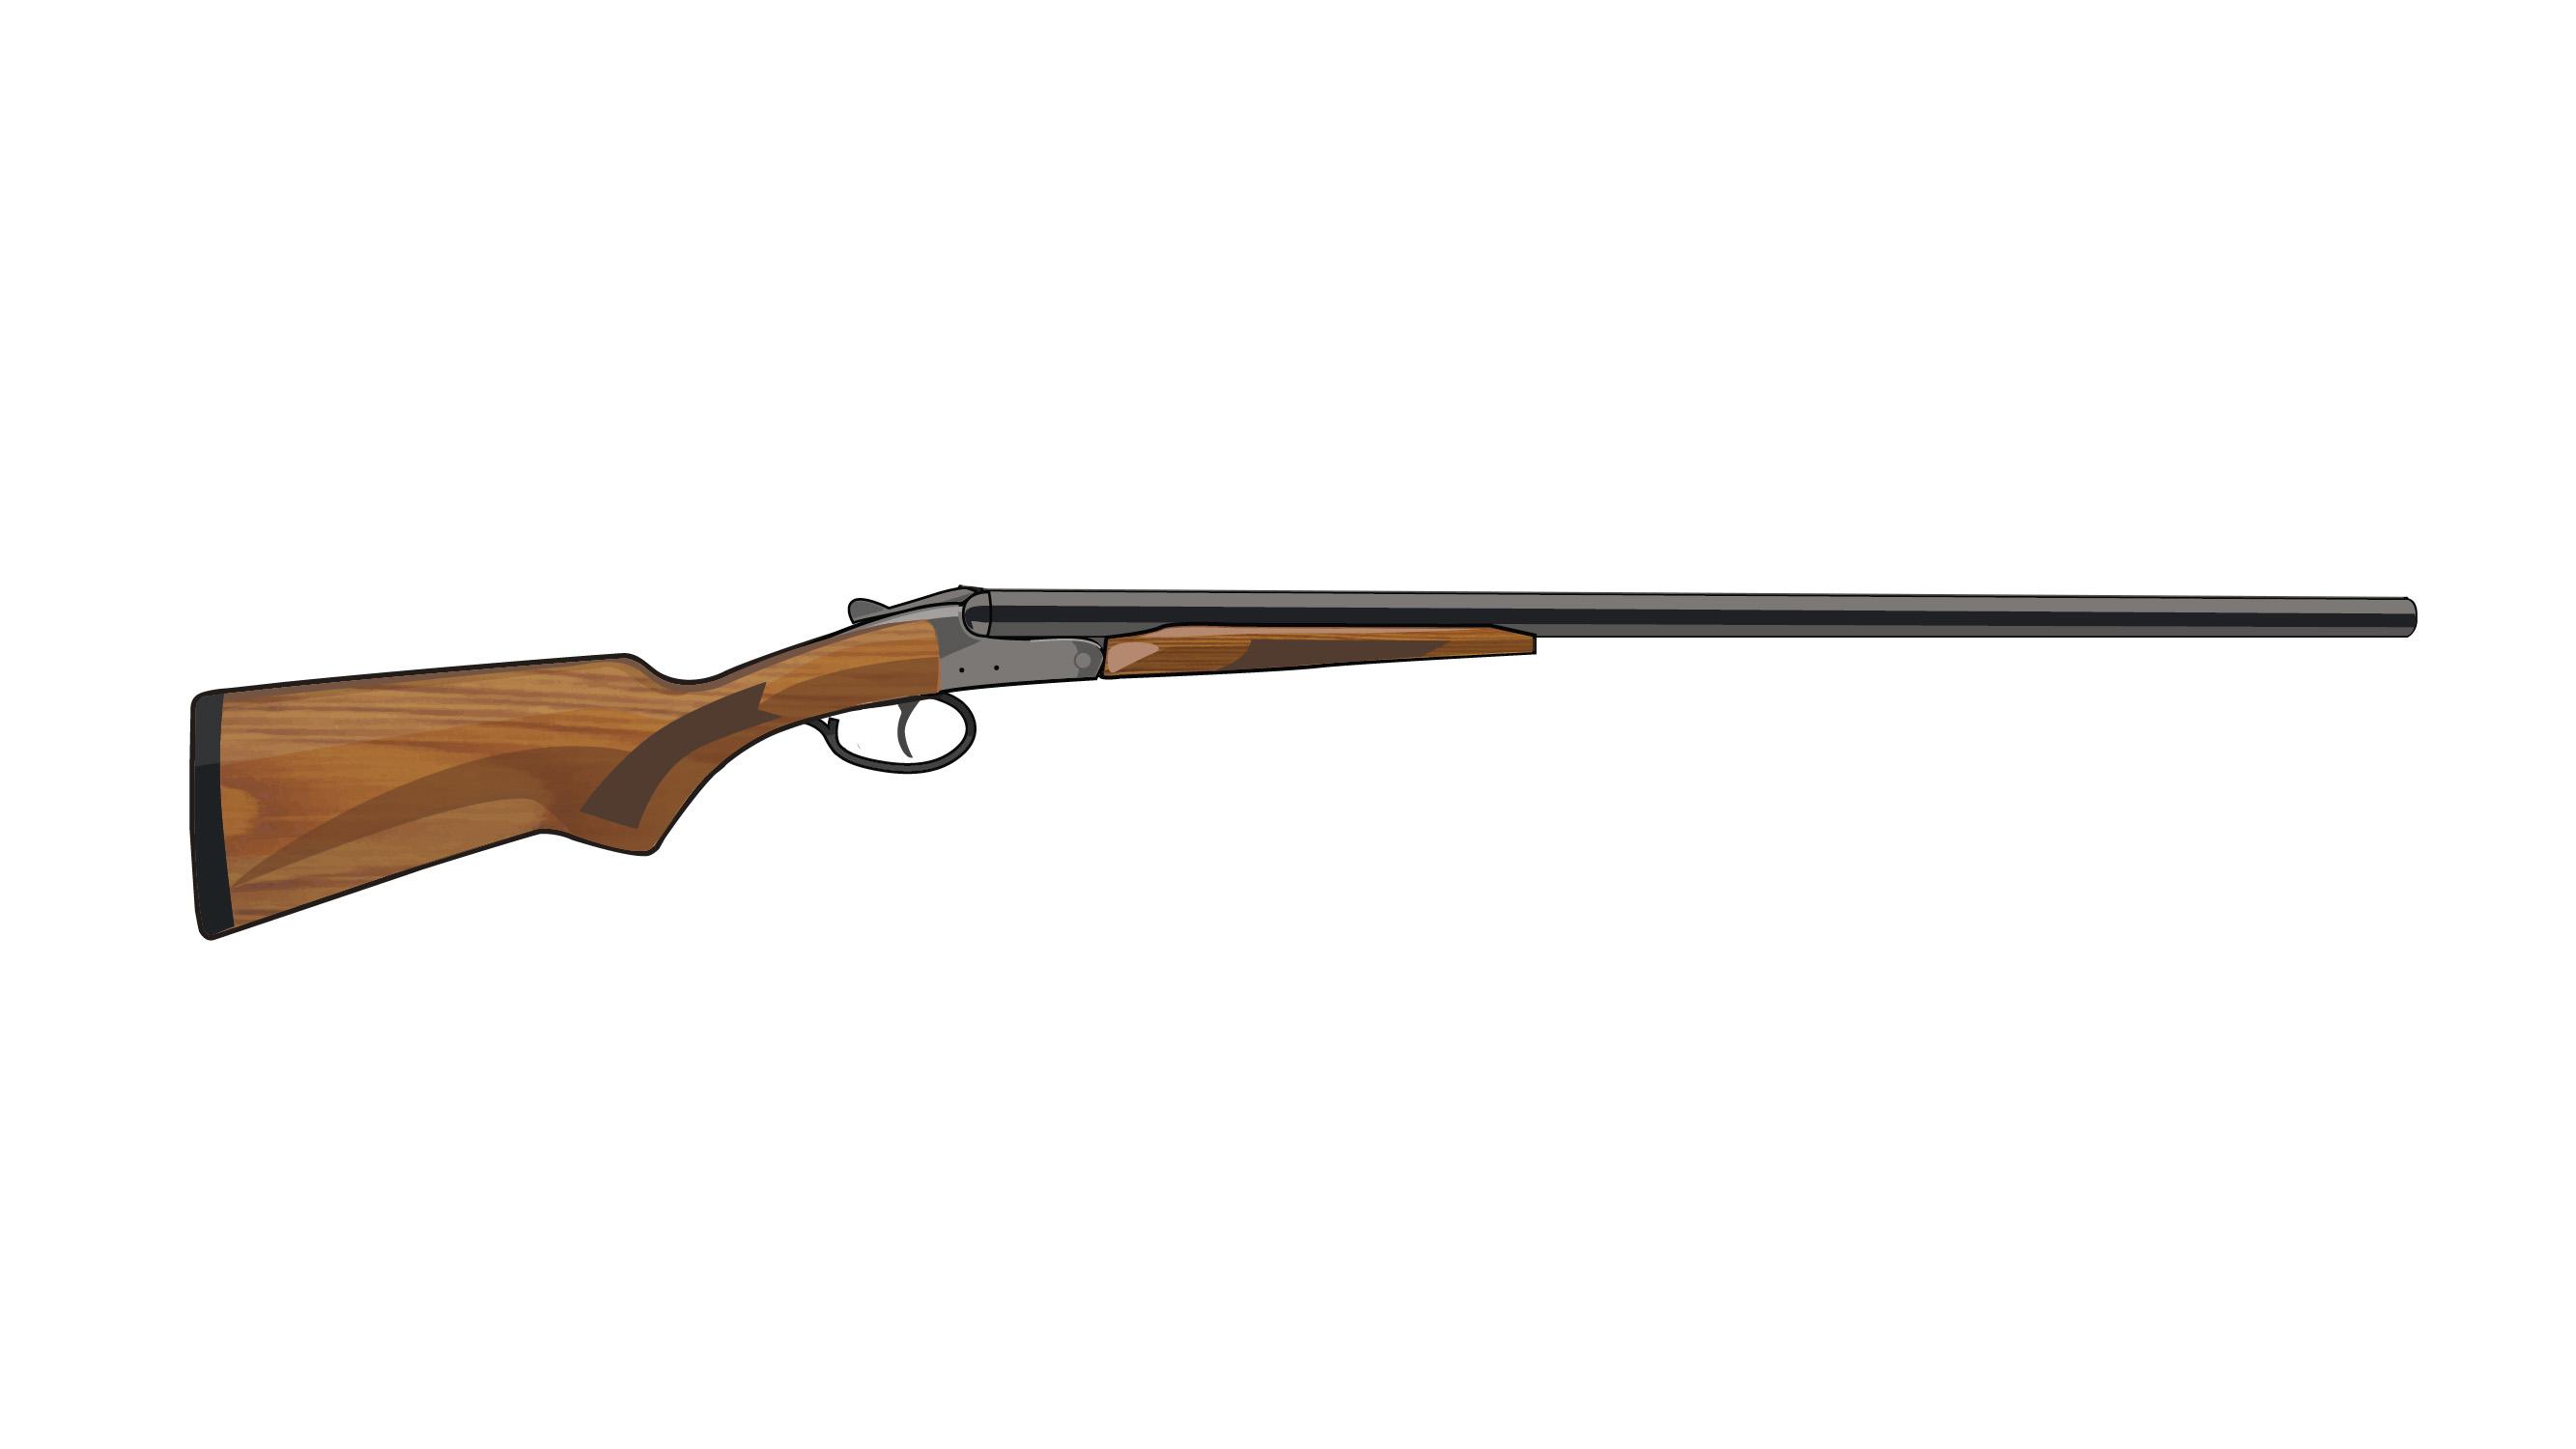 Illustration of a single barrel shotgun.